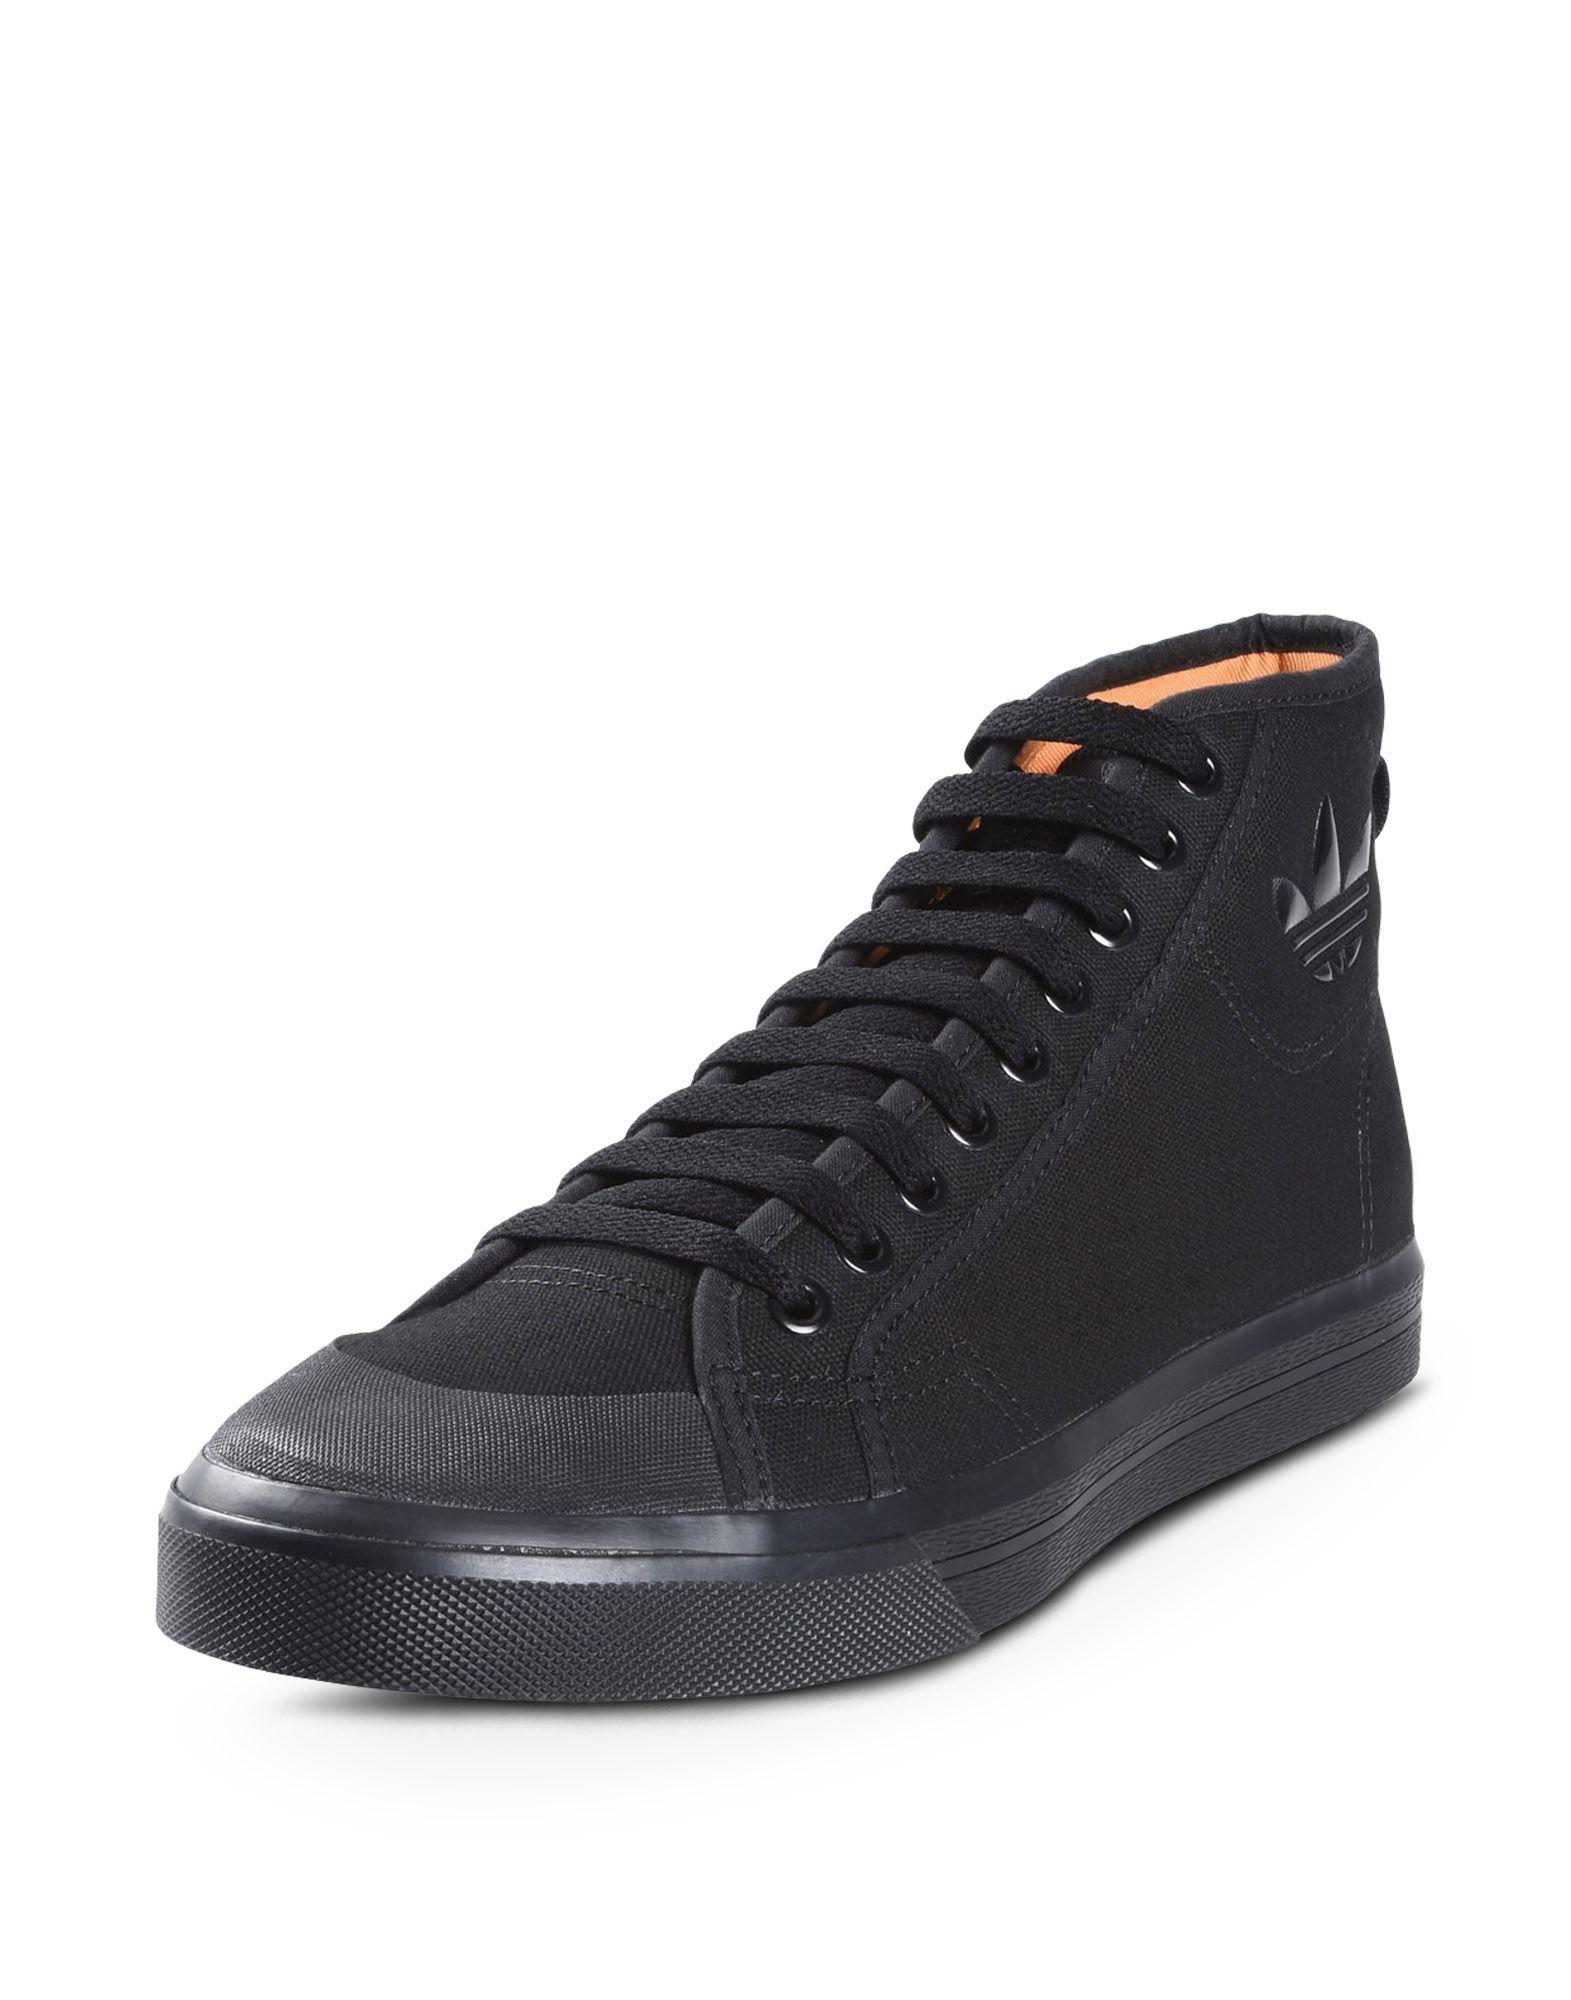 Spirit High sneakers - Black adidas by Raf Simons LIhwgO